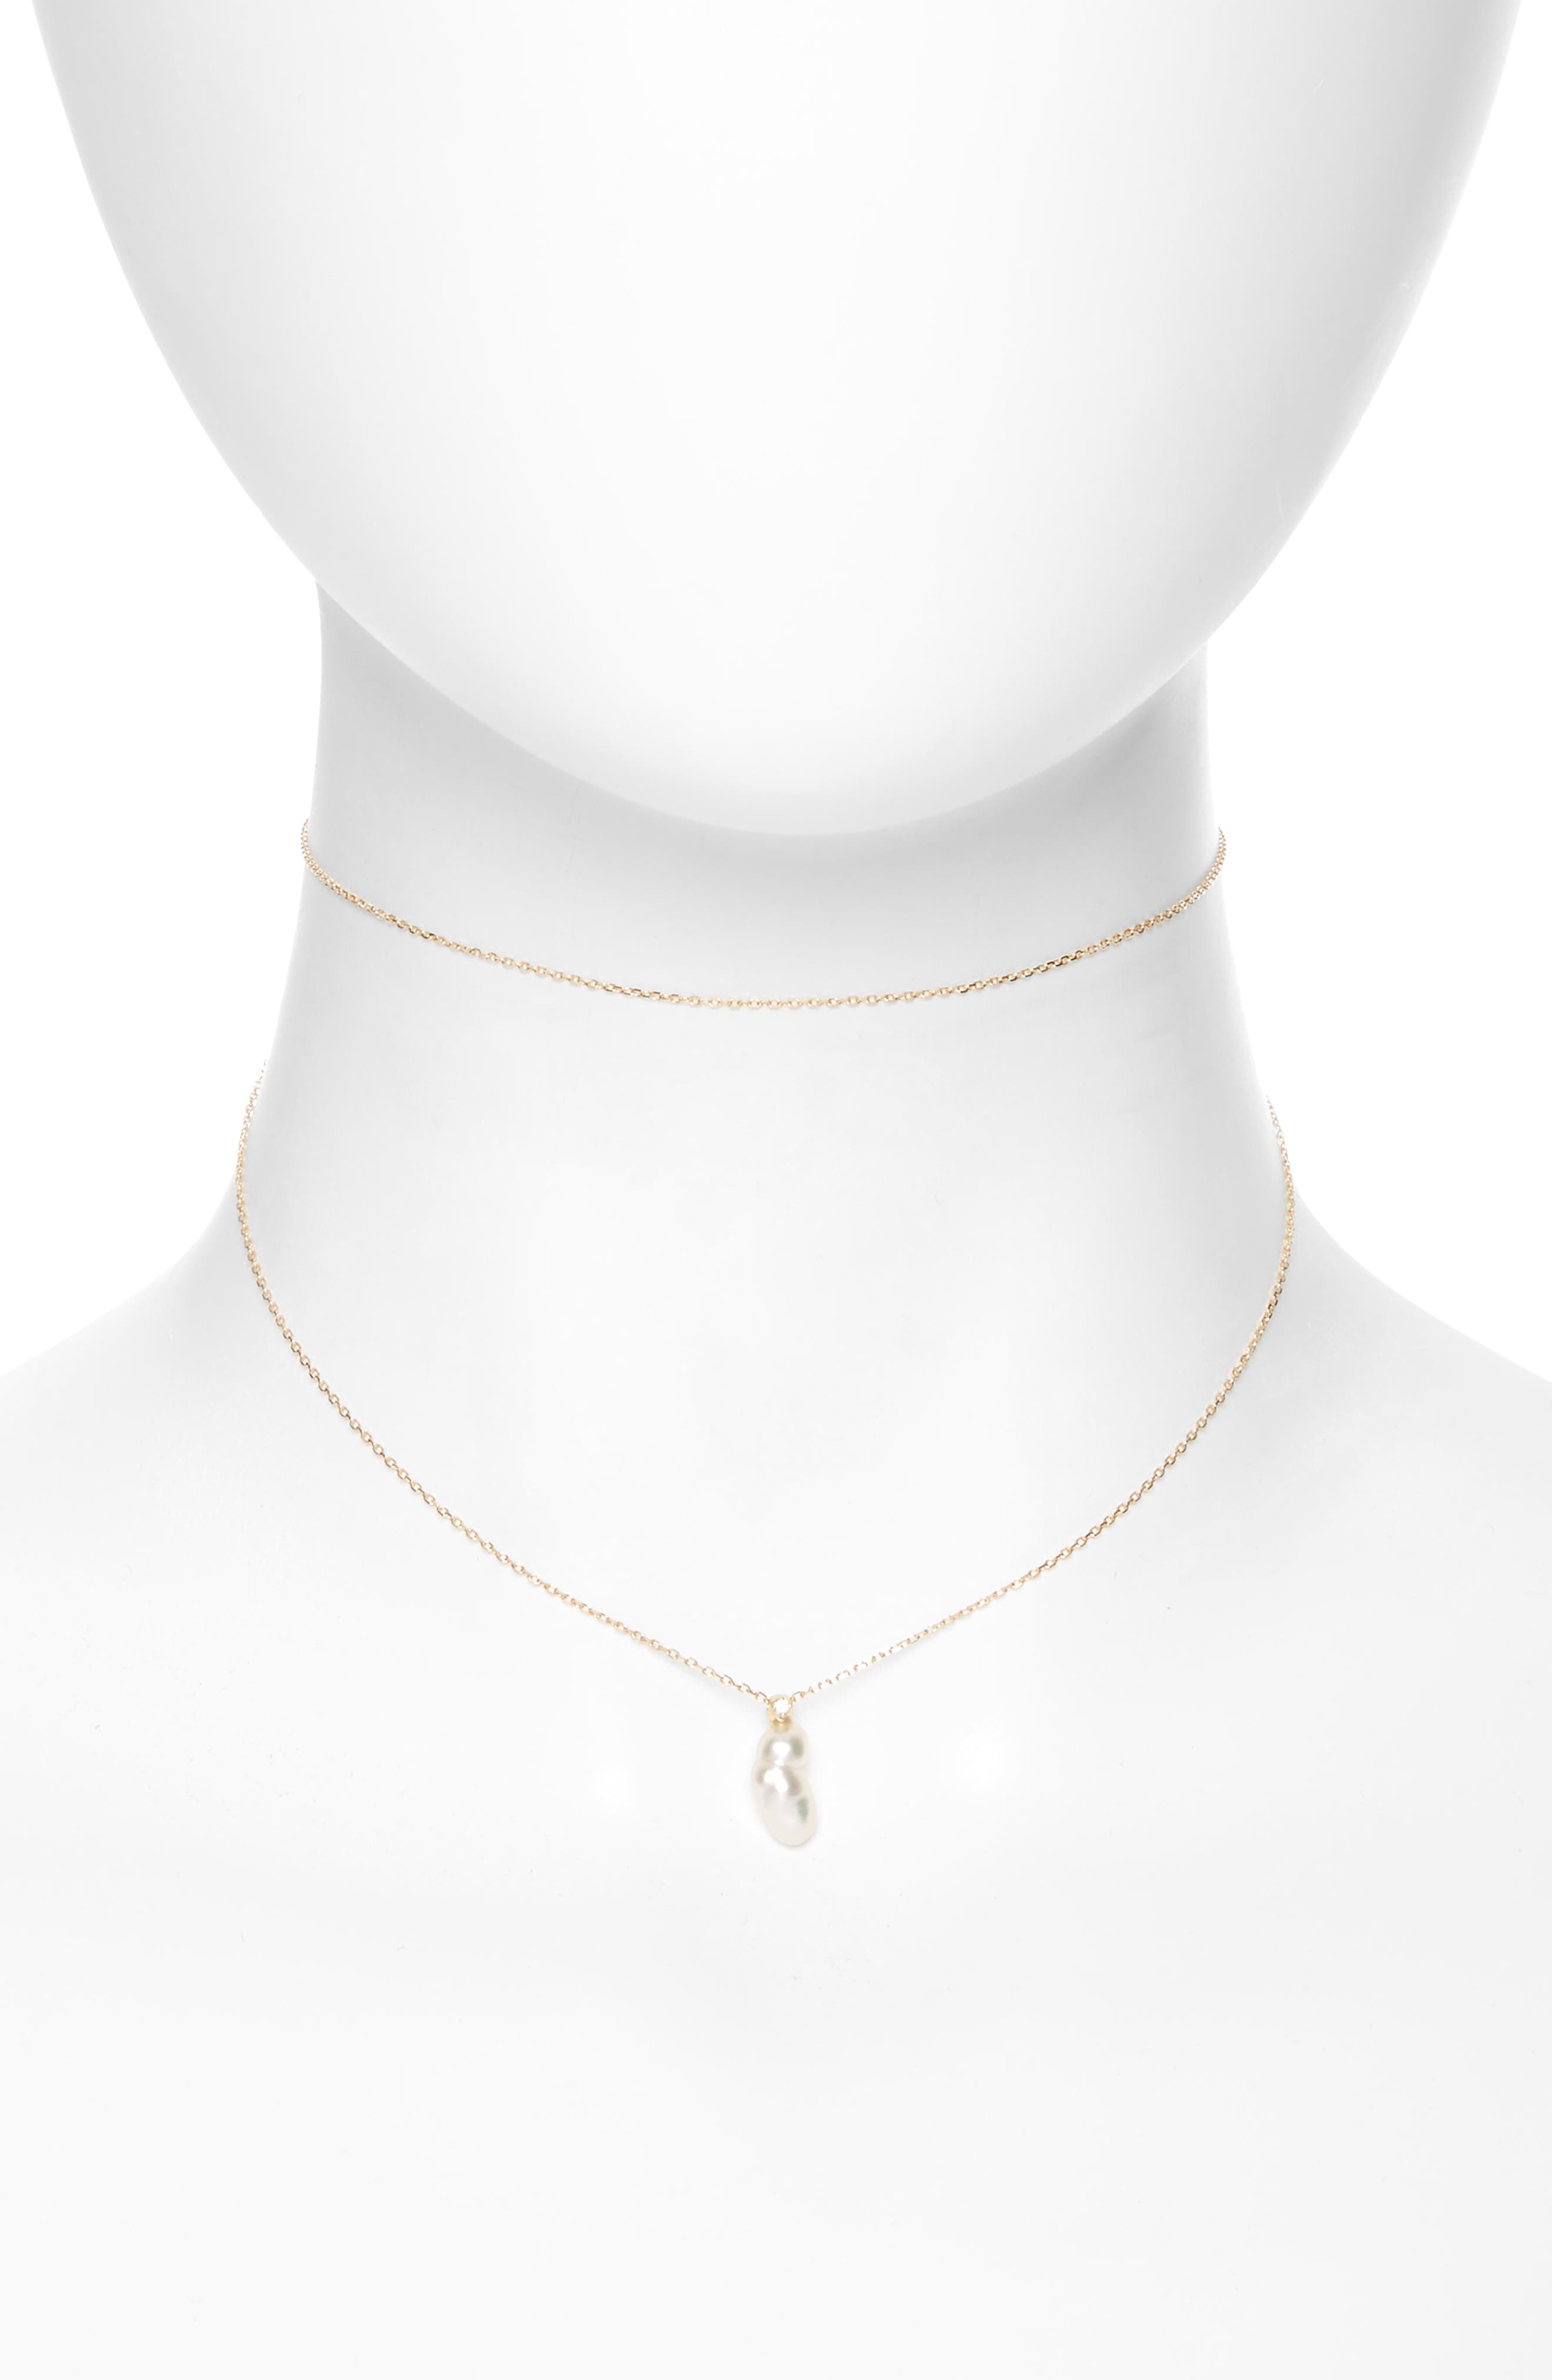 Sea of Beauty Diamond & Keshi Pearl Multistrand Choker,                             Main thumbnail 1, color,                             Yellow Gold/ White Pearl